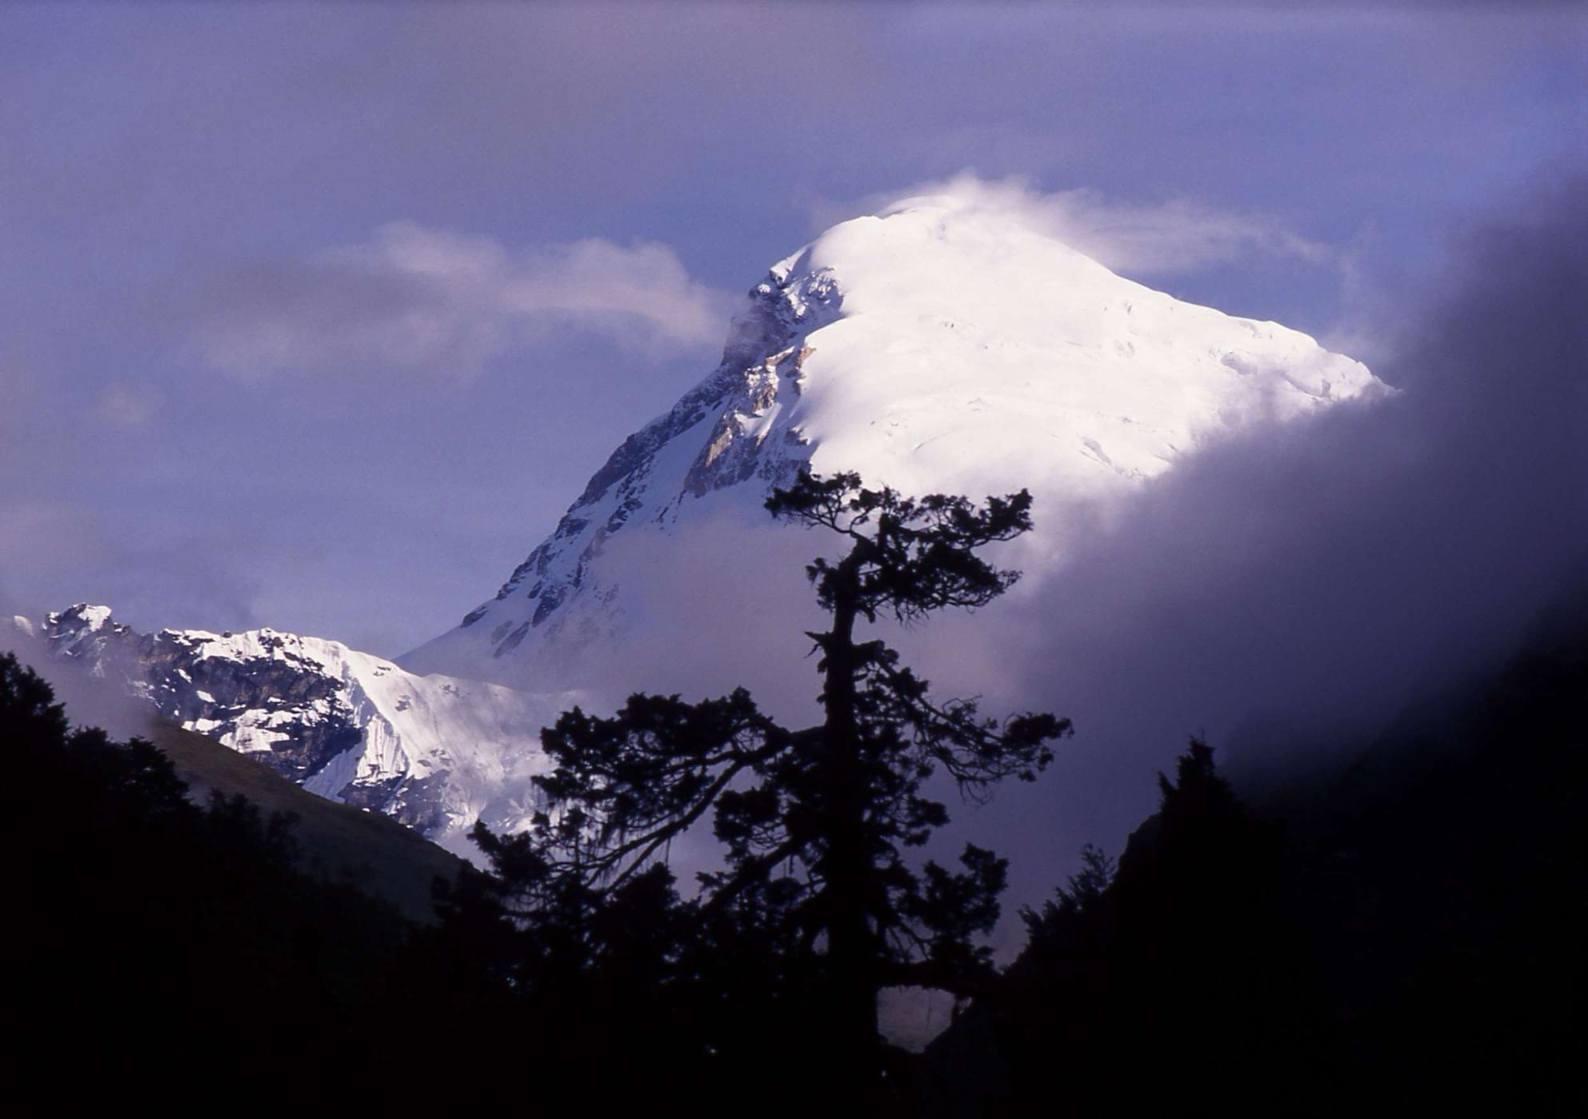 Bhutan Trekking Mt. Jhomolhari